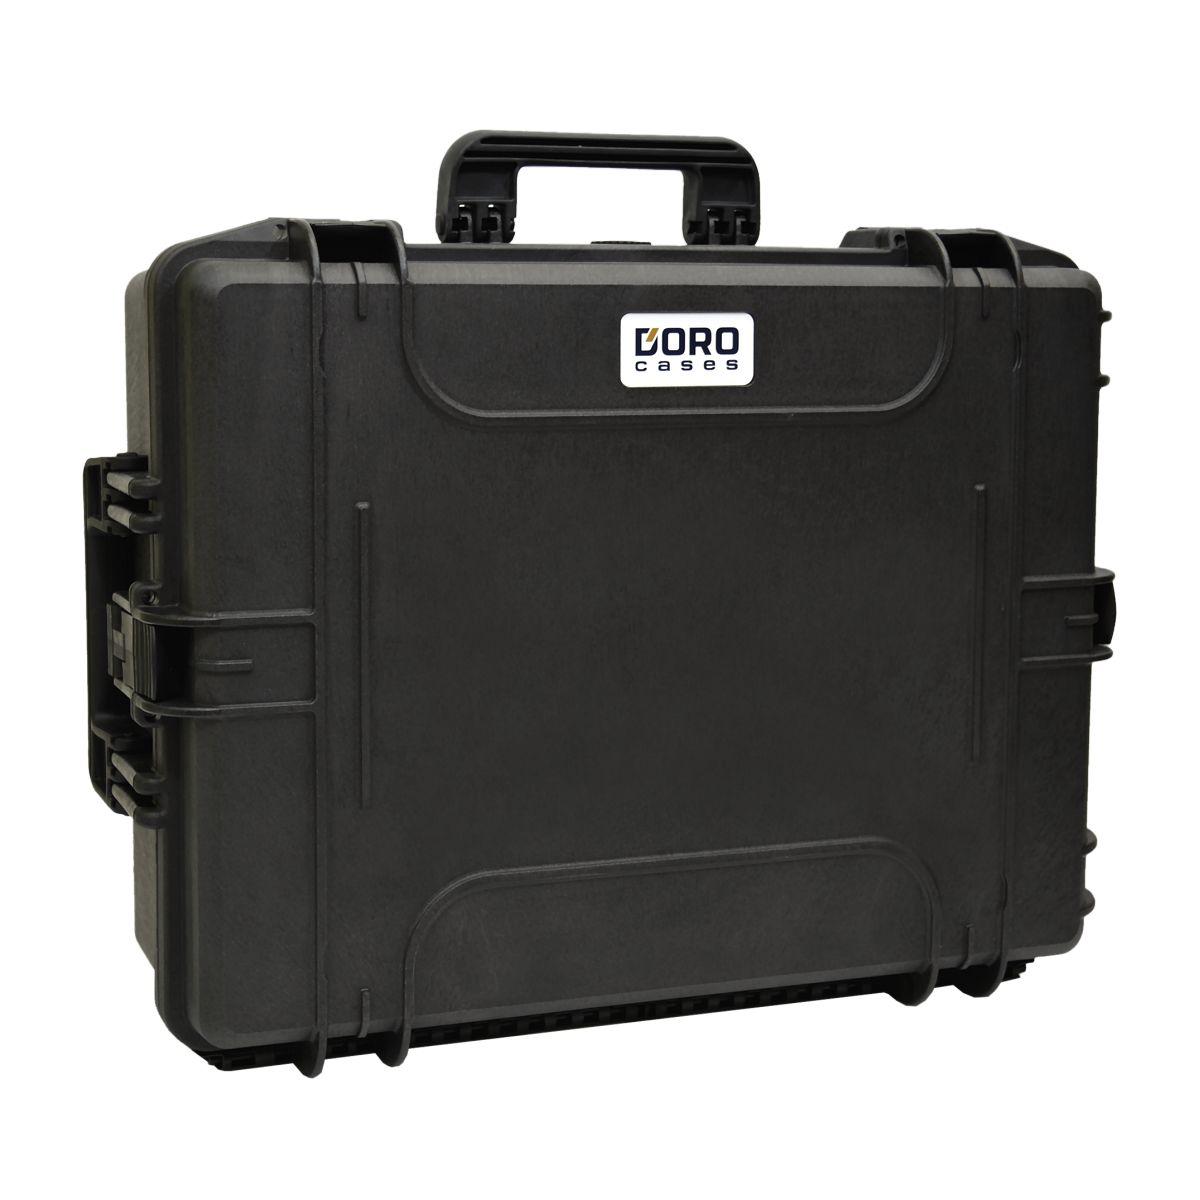 "28 x 3.5"" SATA / PATA / IDE Wheeled Hard Drive Storage Case - DORO D2116-7W"